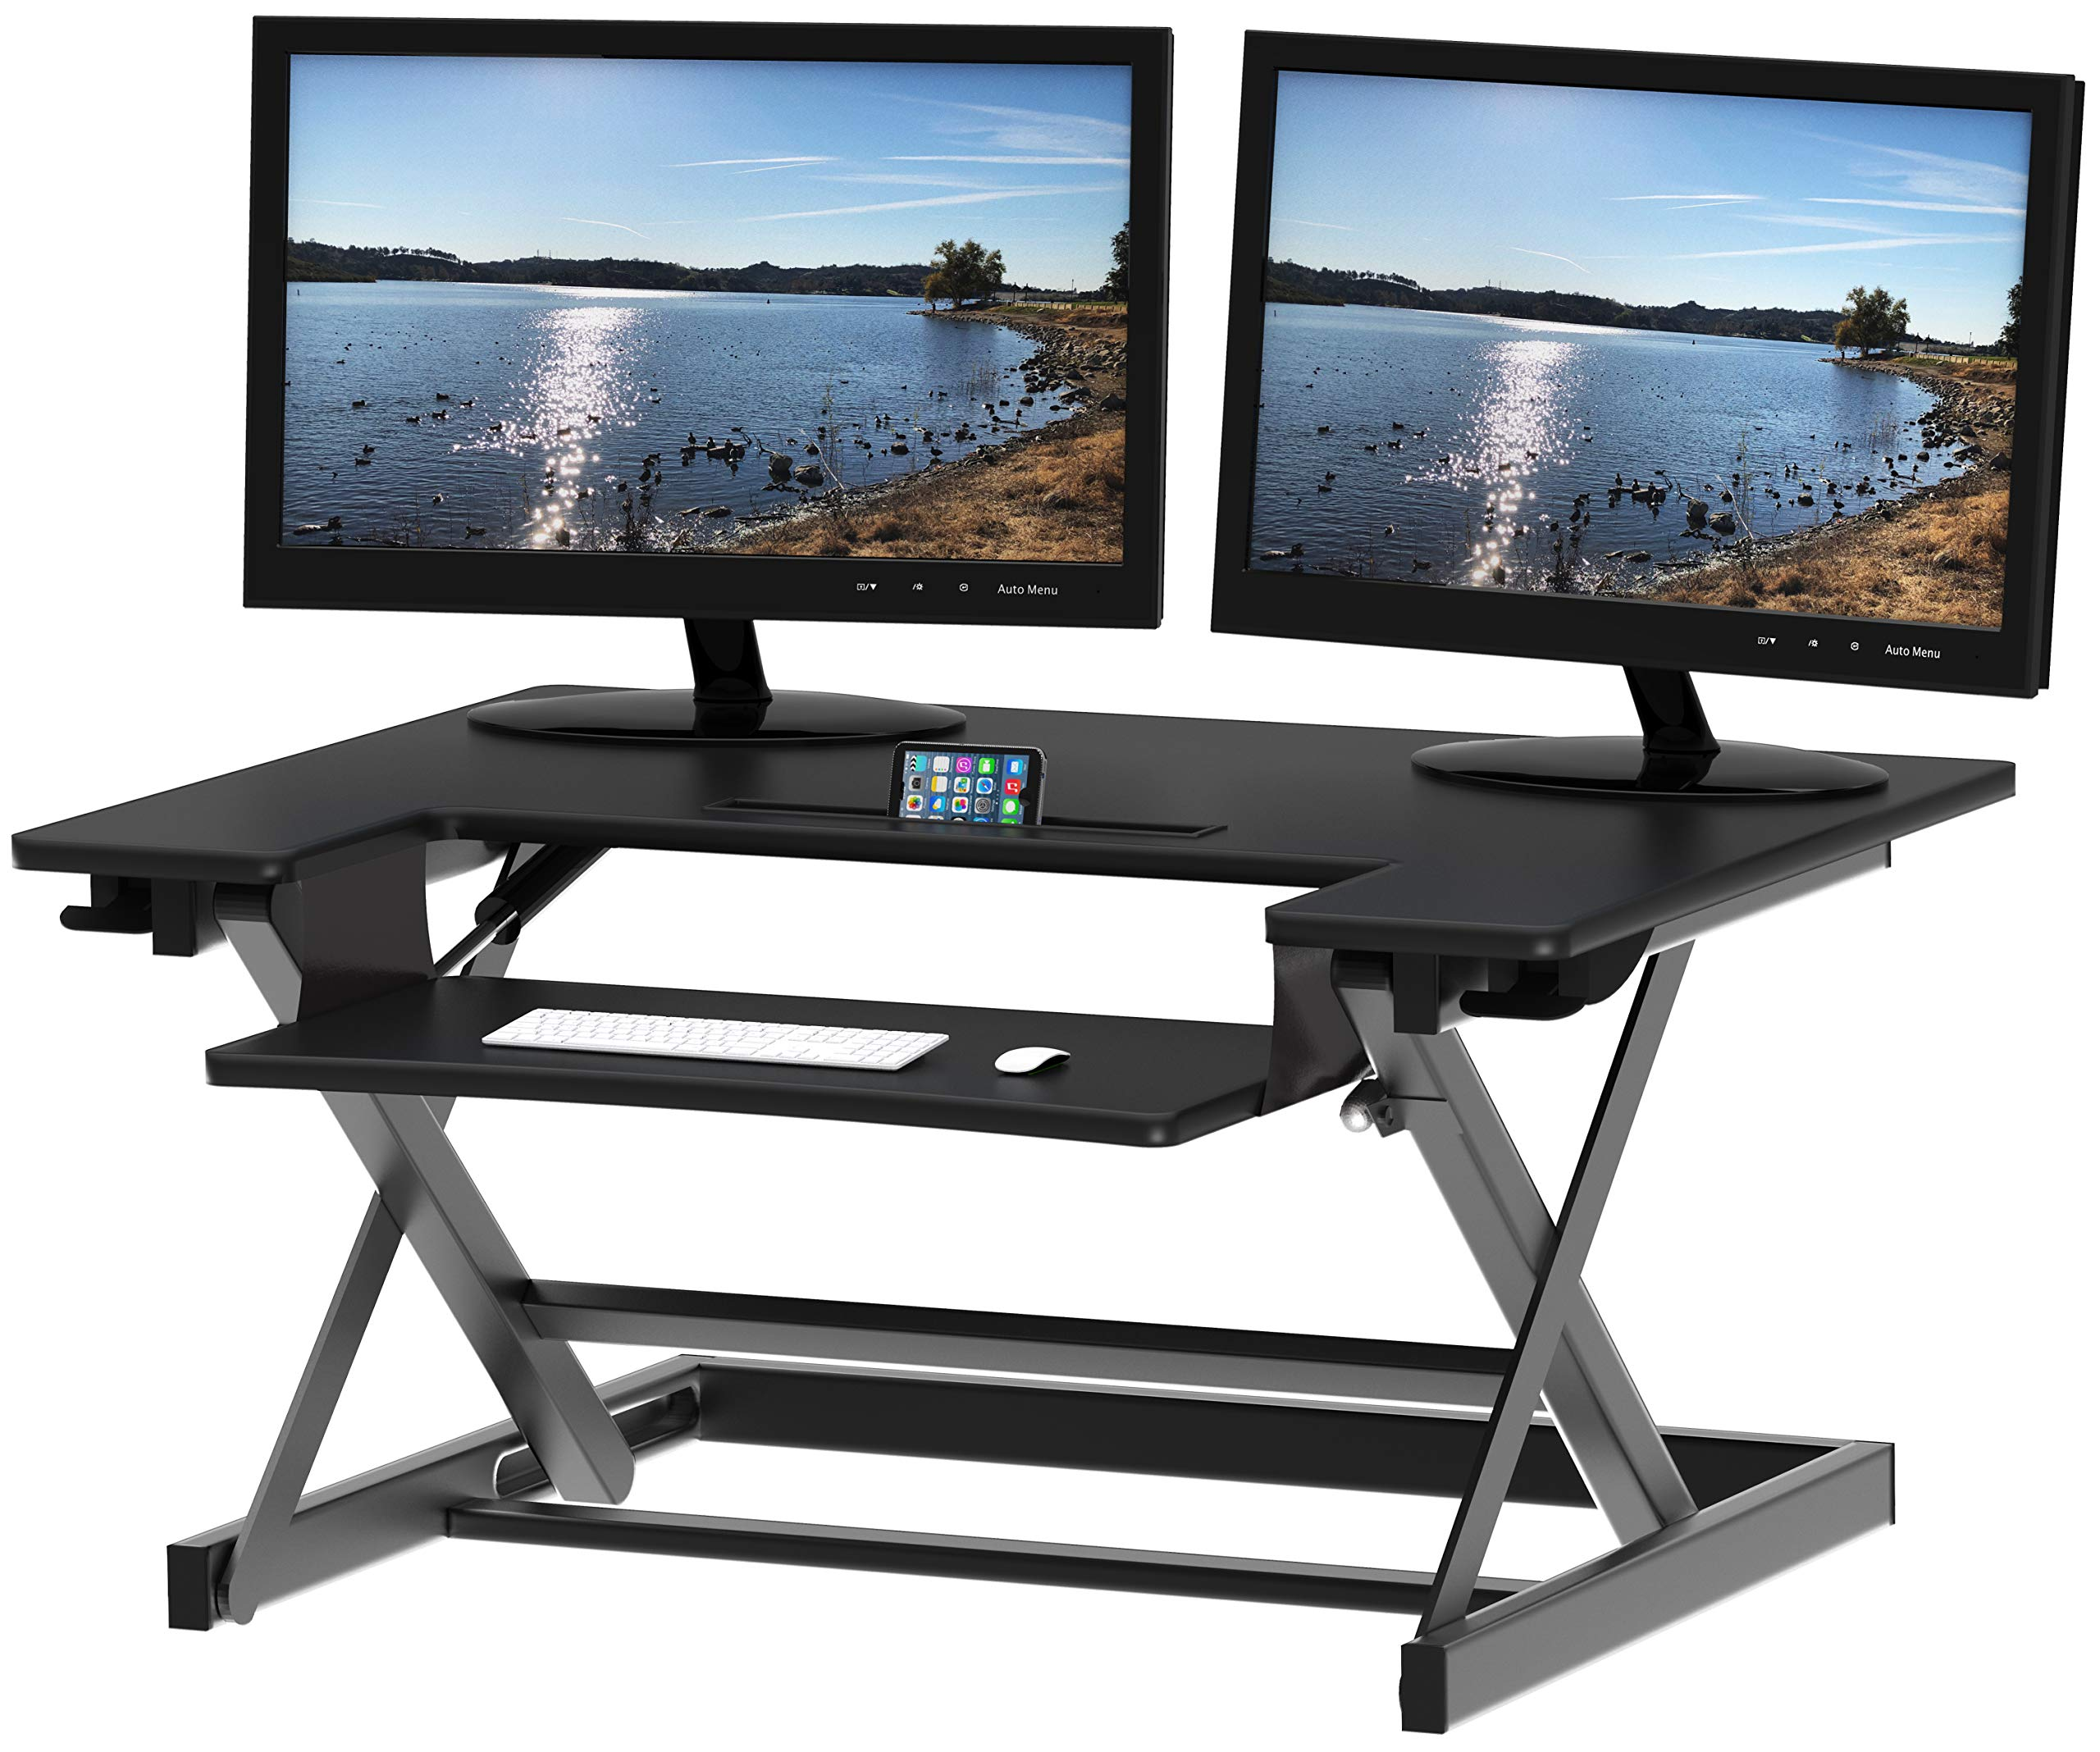 SHW Height Adjustable Sit to Stand Desk Riser Converter Workstation, Black by SHW